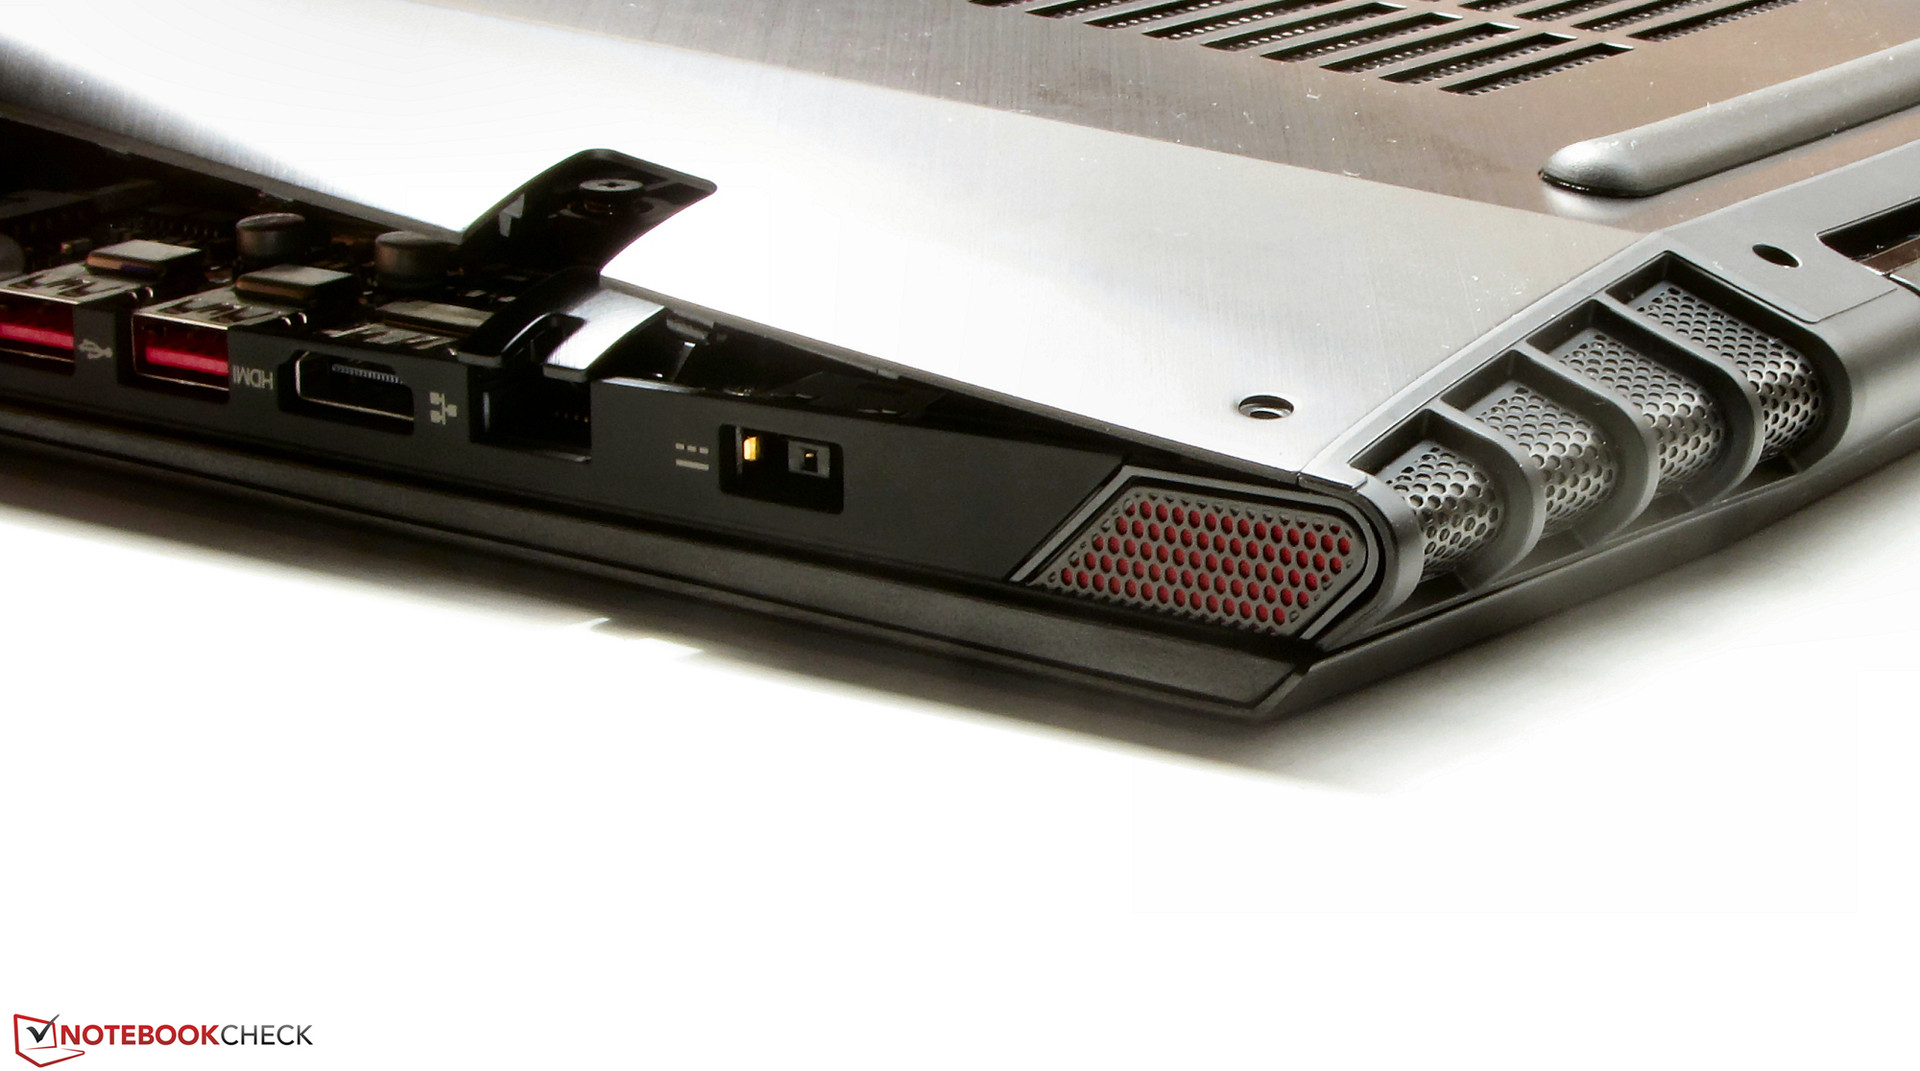 Lenovo Y50-70 (GTX 960M, 4K) Notebook Review - NotebookCheck net Reviews